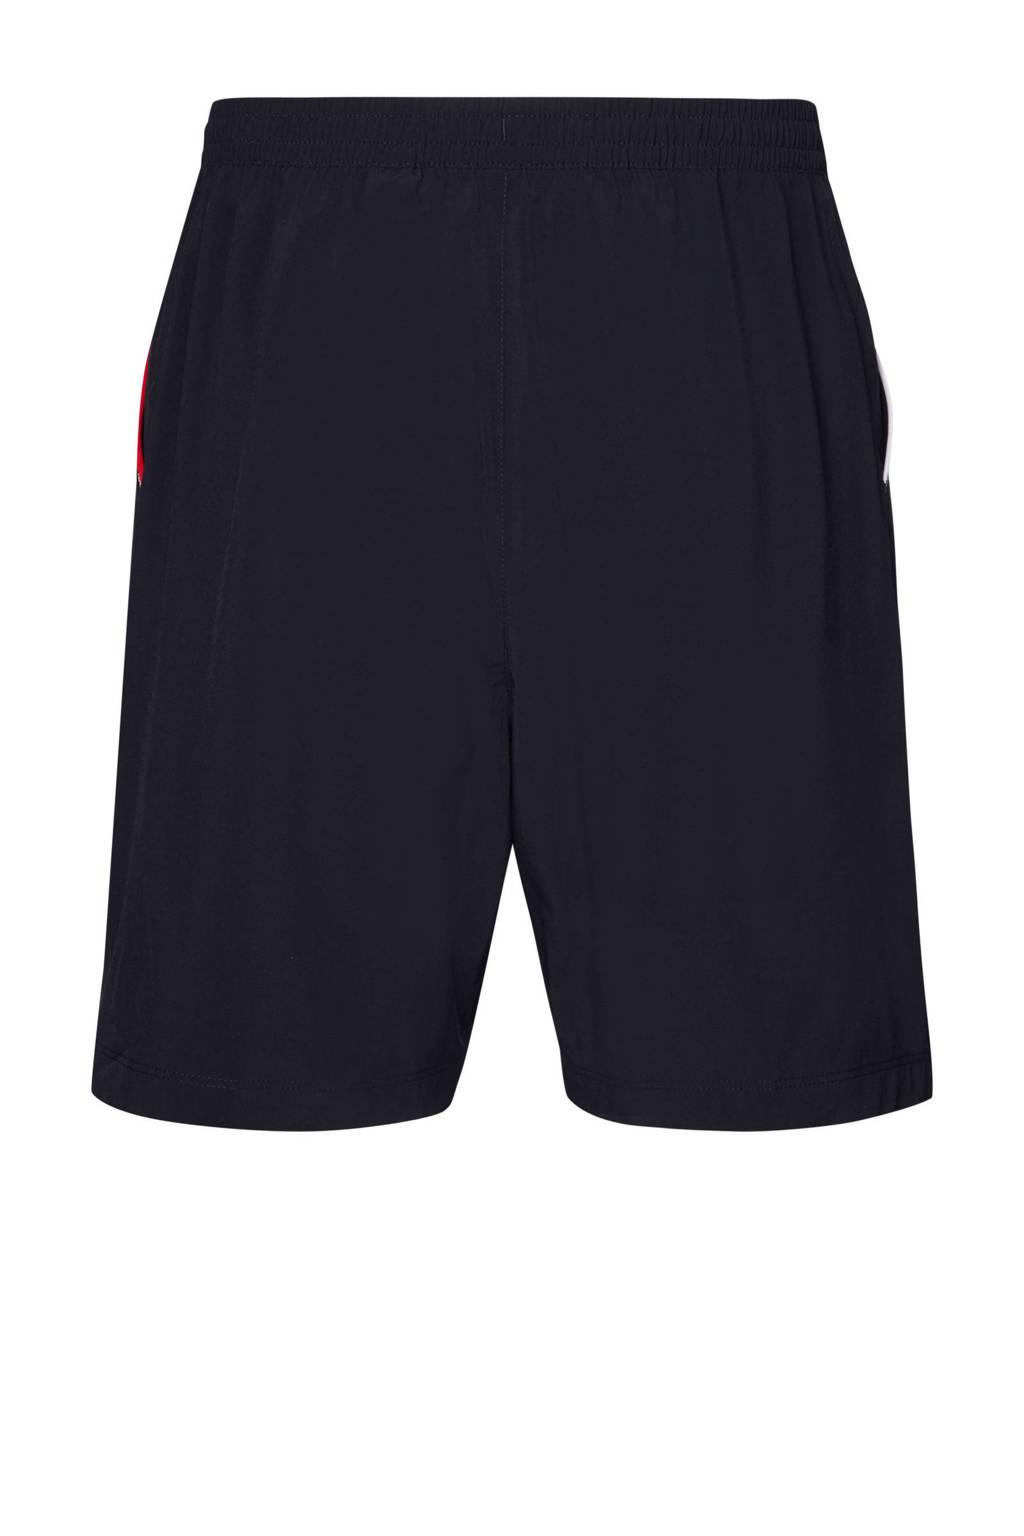 Tommy Hilfiger Sport   short zwart, Zwart